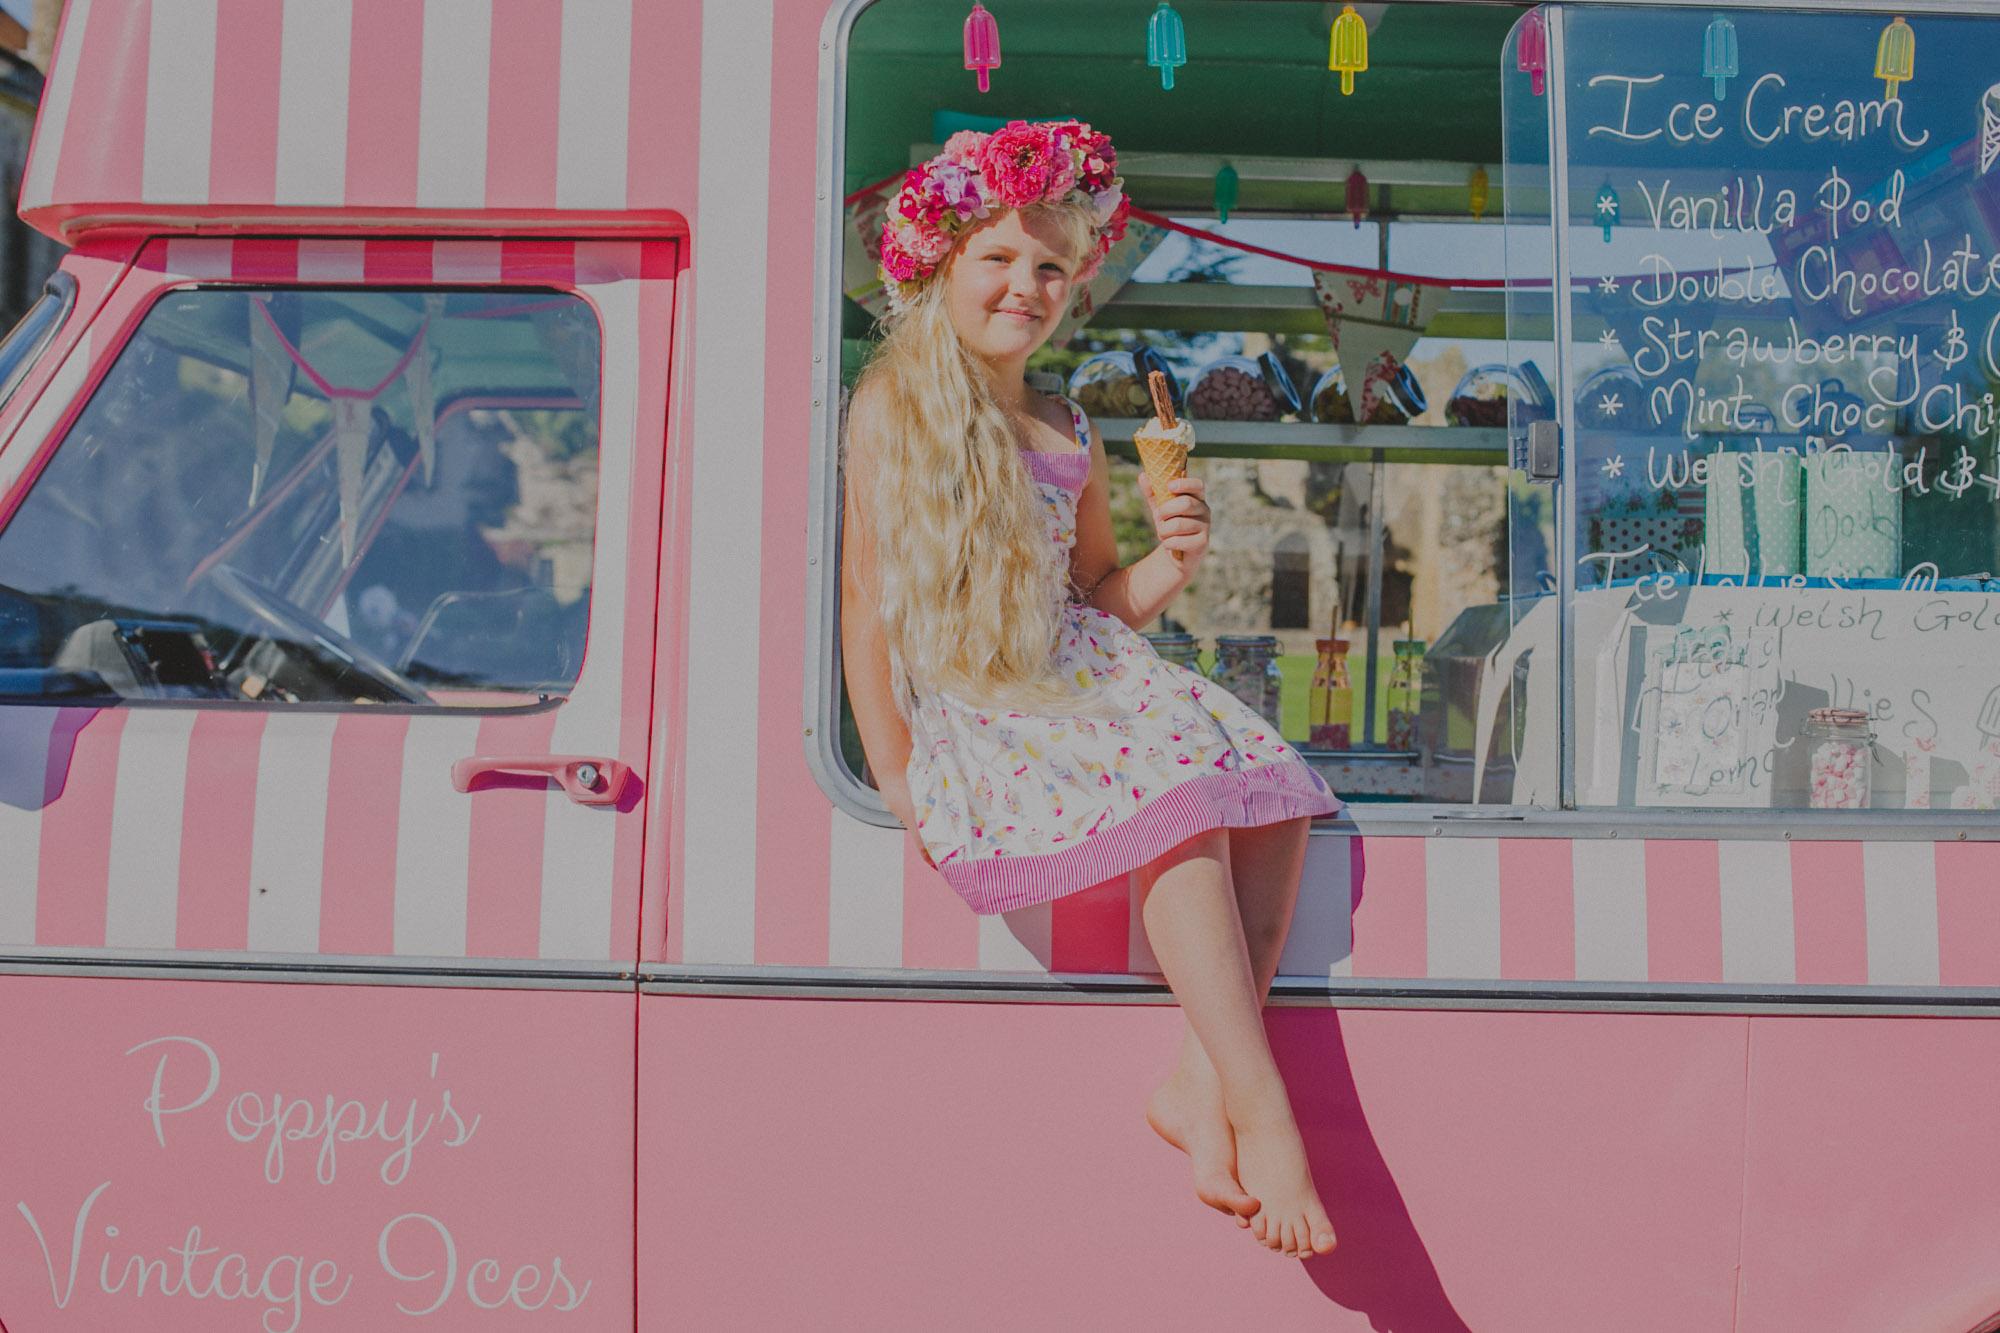 Vintage_ice_cream_South_Wales-39.jpg